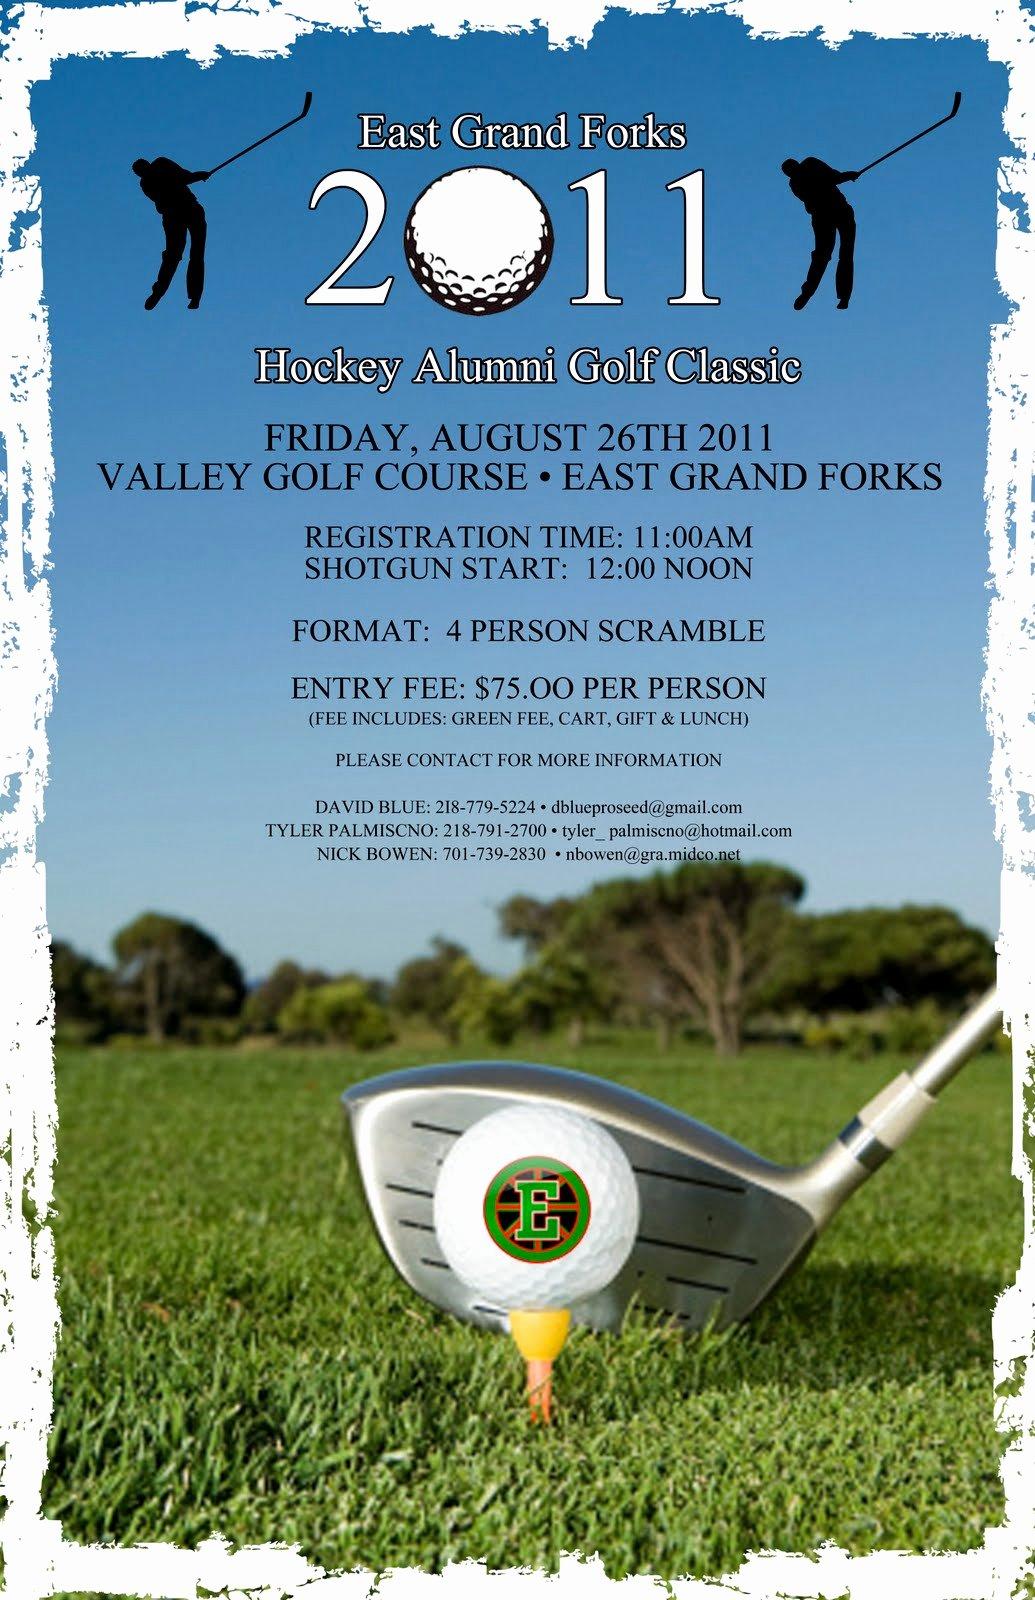 Free Golf tournament Flyers Templates Elegant East Grand forks Greenwave Hockey Golf tournament